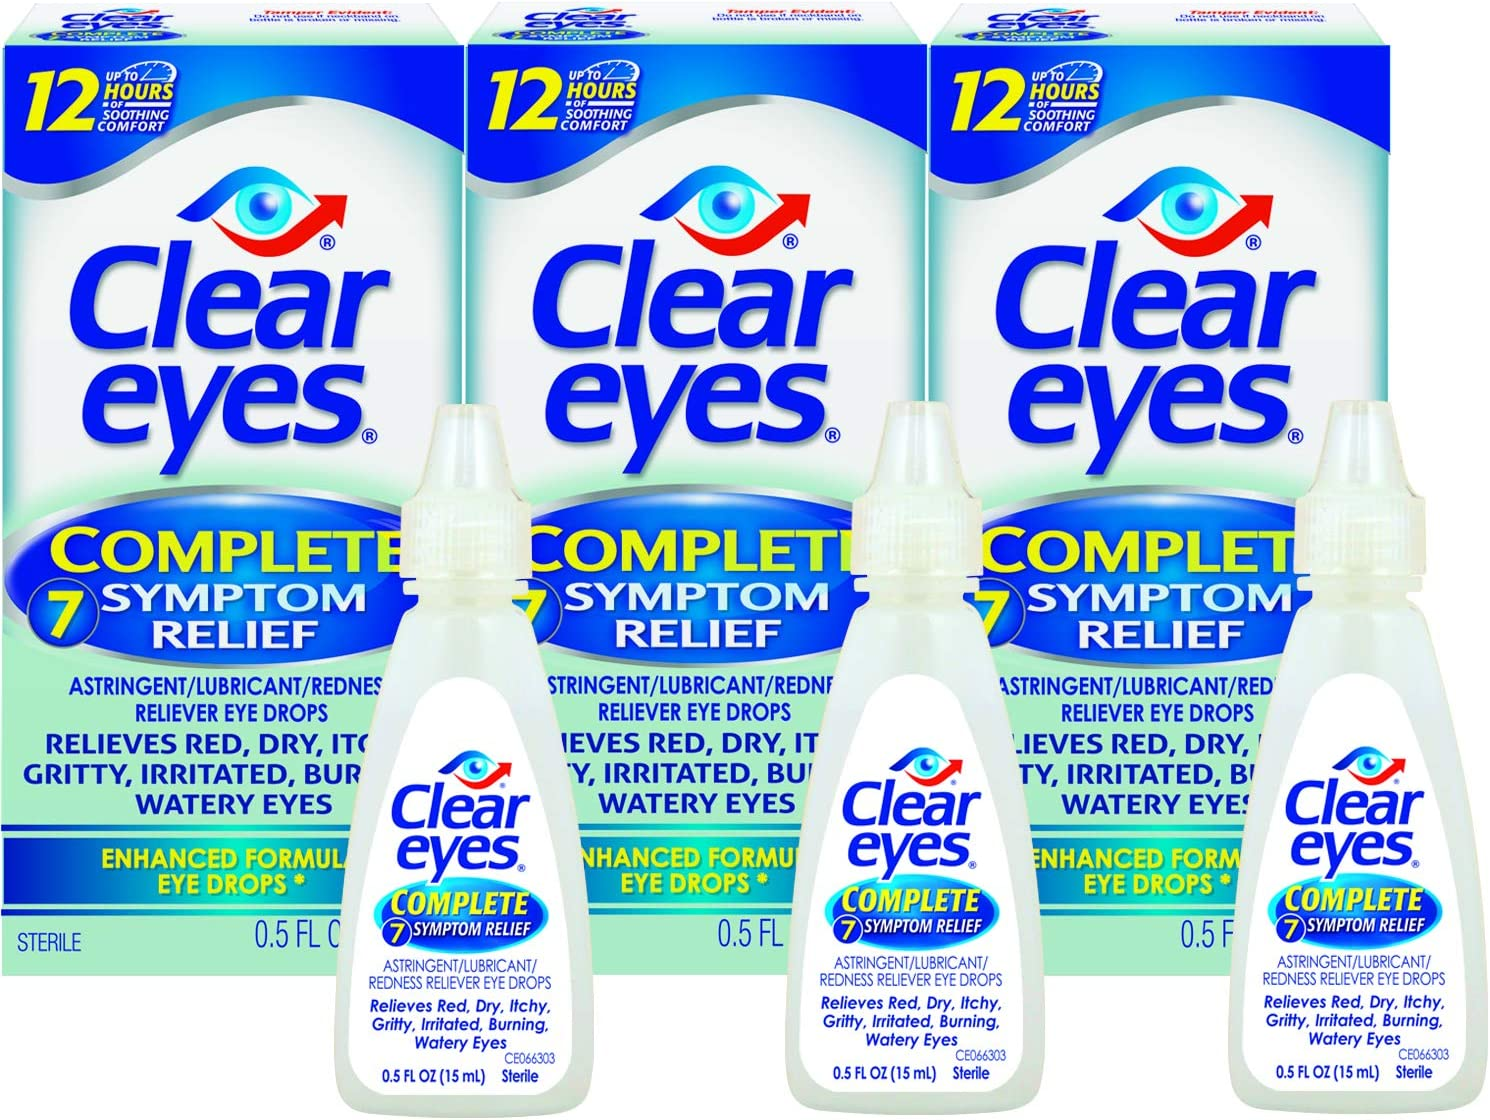 Clear Eyes | Complete 7 Symptom Relief Enhanced Formula Eye Drops | 0.5 FL OZ | Pack of 3